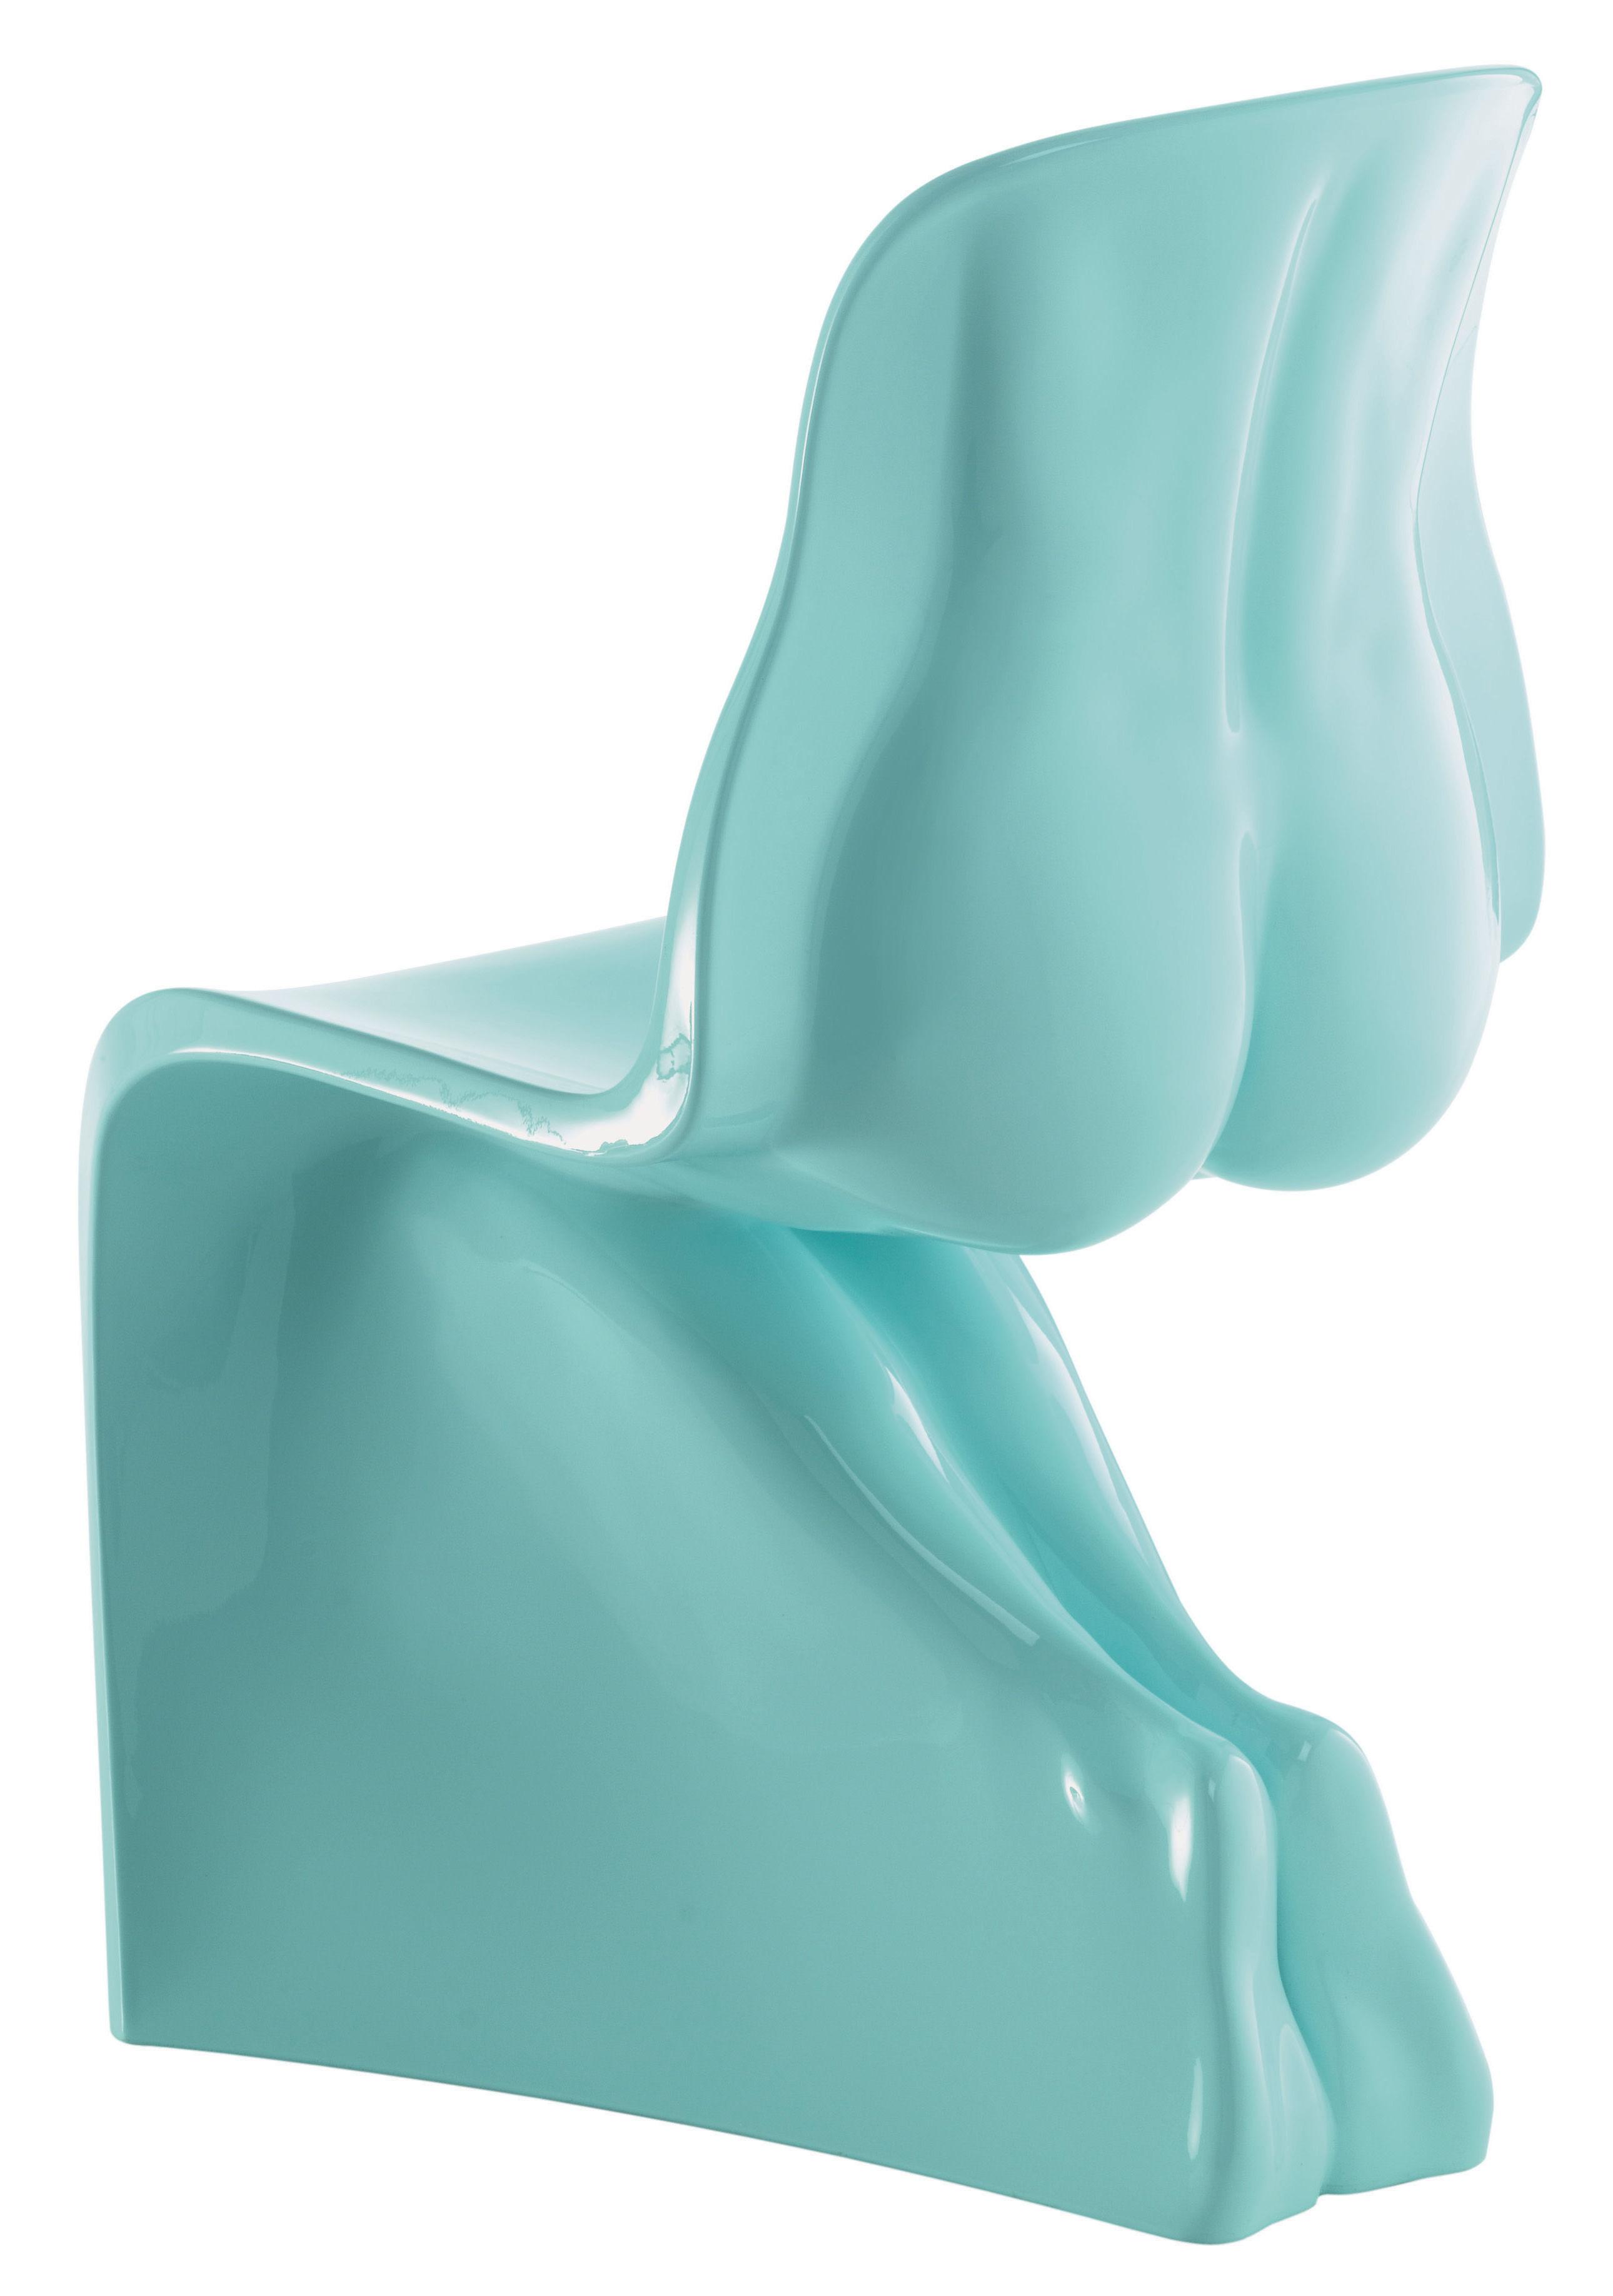 Möbel - Stühle  - Her Stuhl lackiert - Casamania - Himmelblau - Polyäthylen